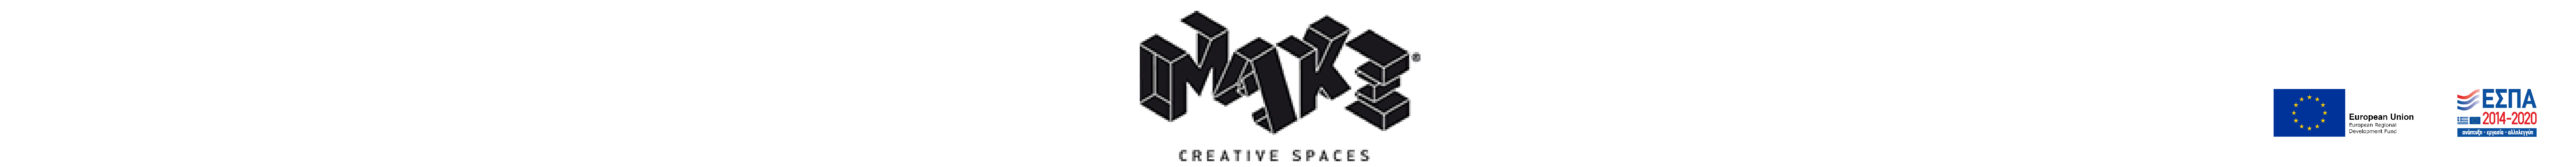 MAKE Creative Spaces Logo